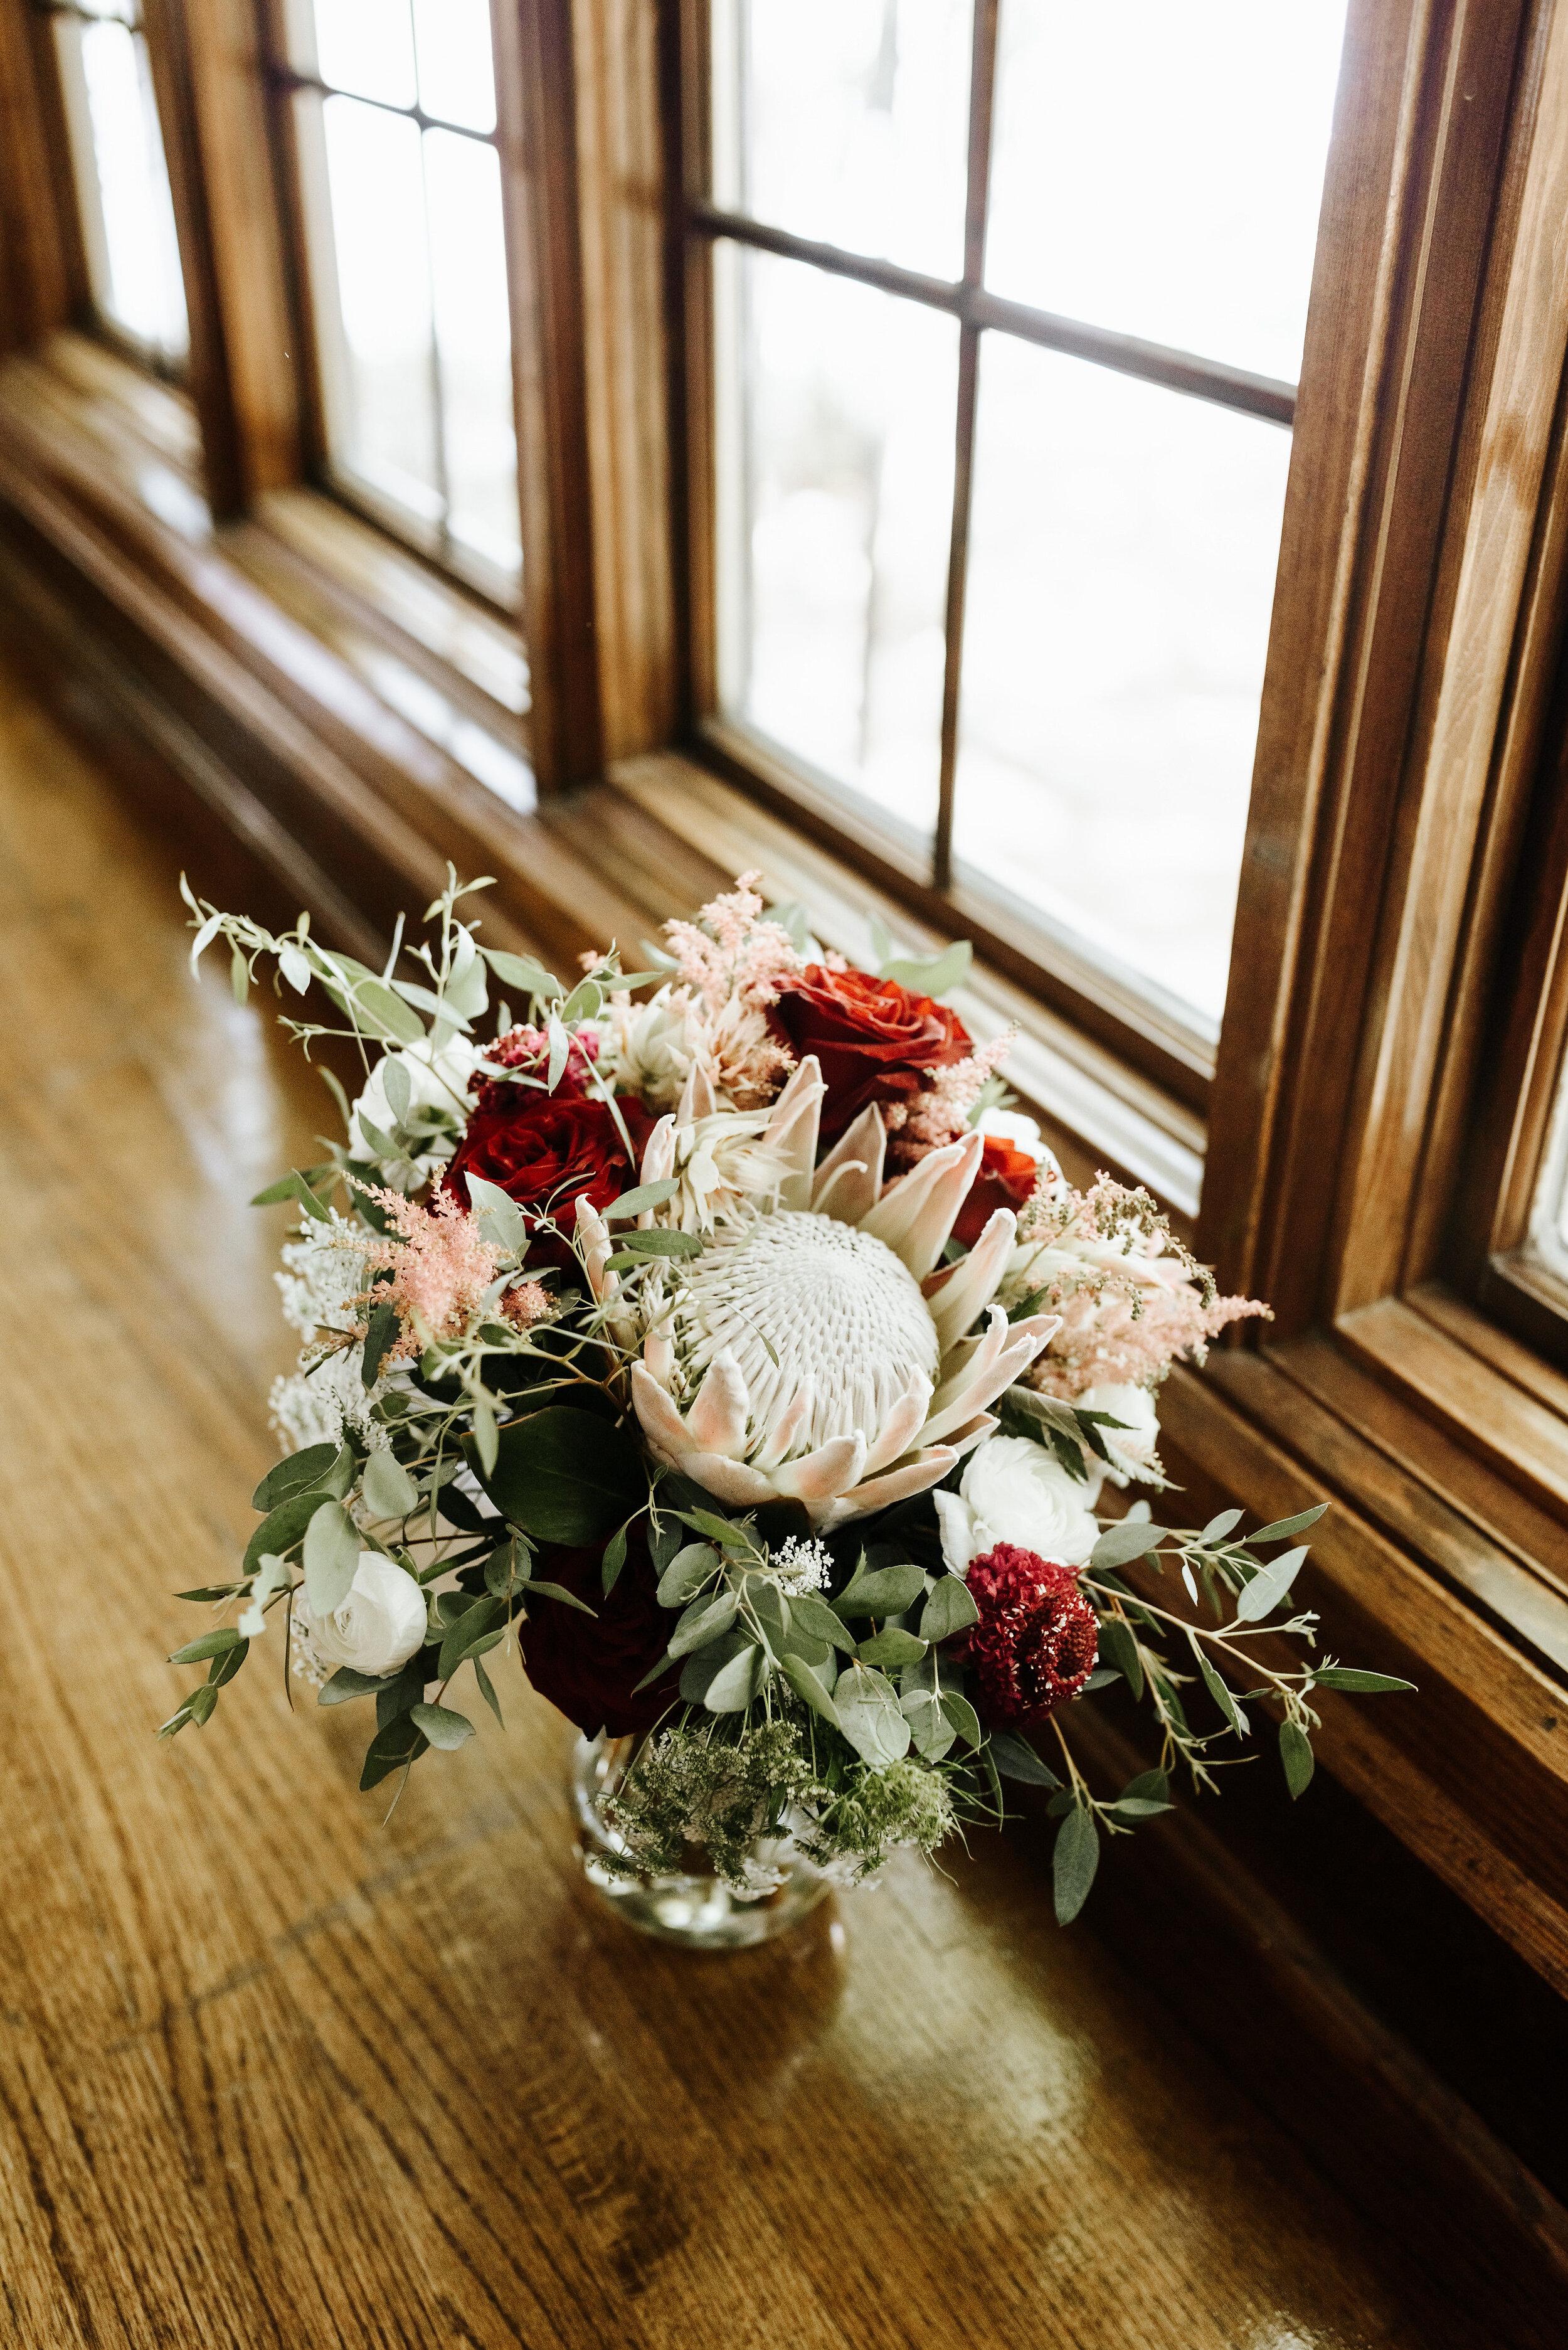 Emily_Mike_Wedding_Celebrations_at_the_Reservoir_Pool_Pavilion_Richmond_Virginia_Wedding_Photographer_Photography_by_V_2.jpg